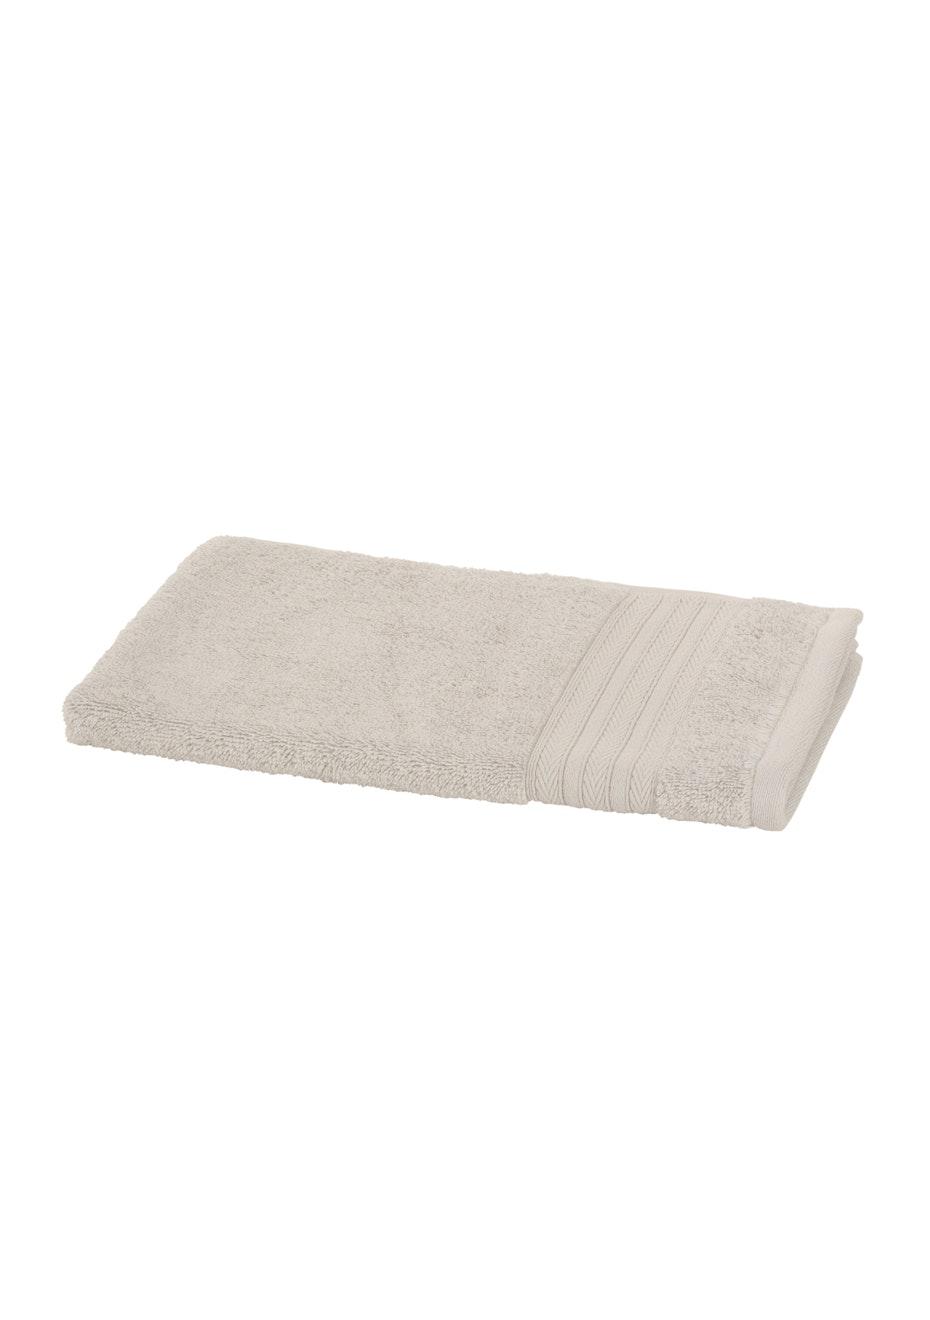 Charisma Egyptian Hand Towel Silver